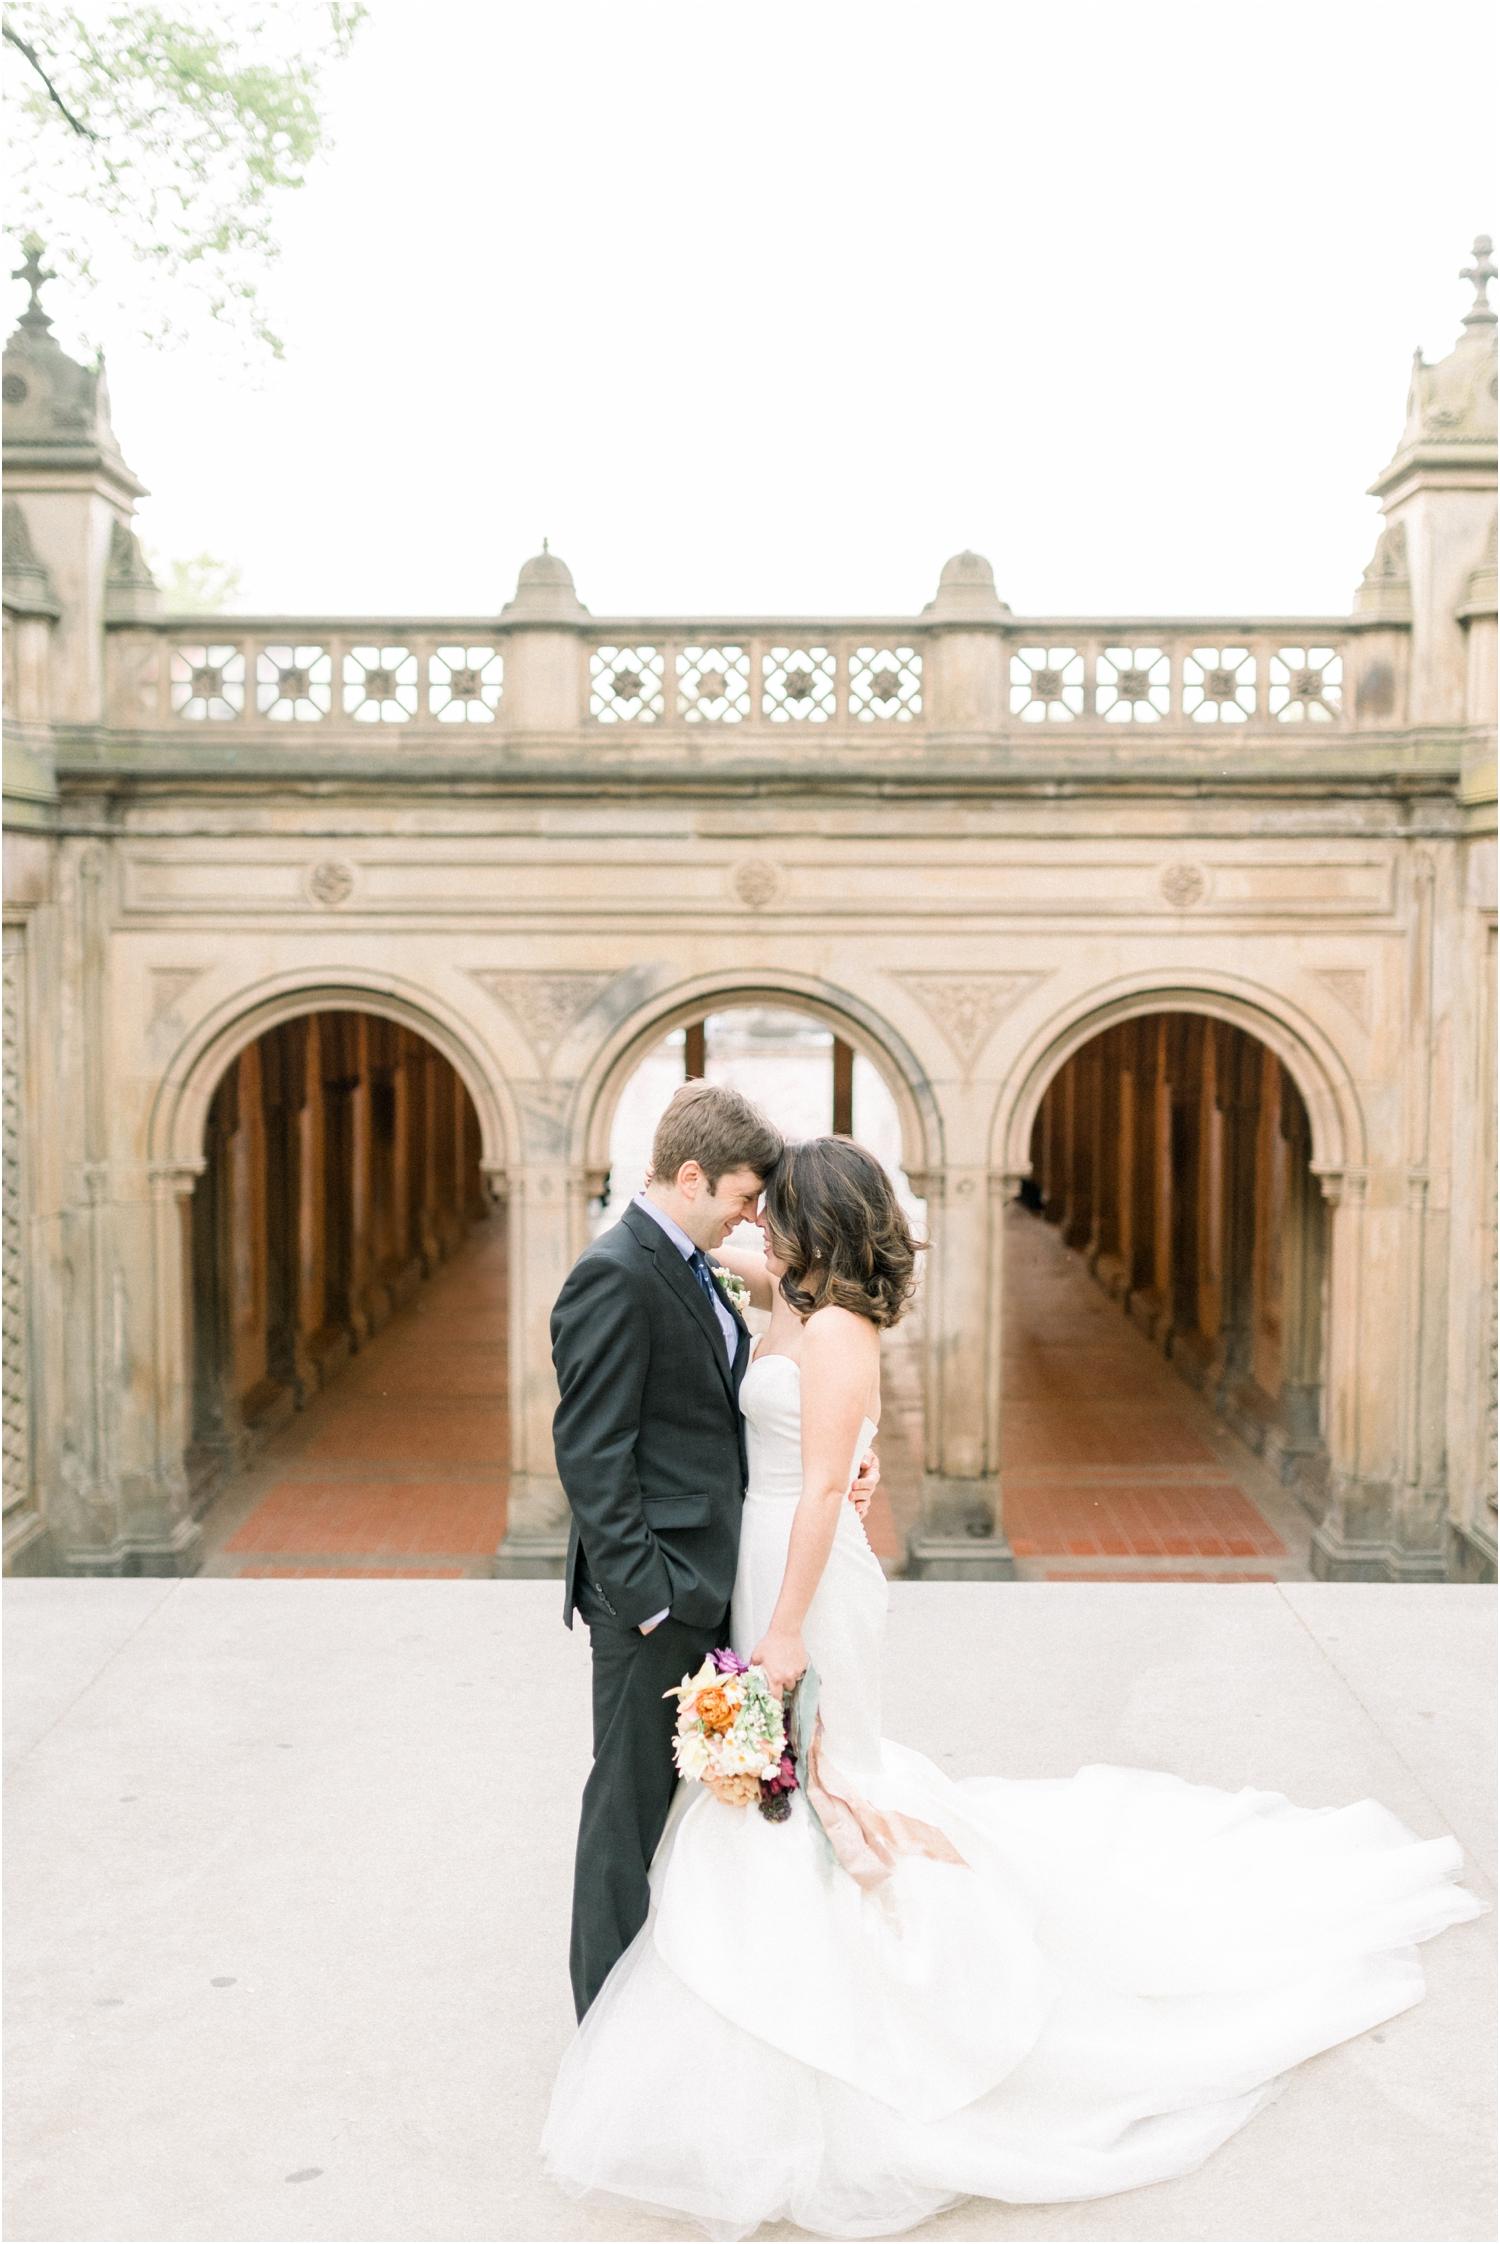 Bethesda terrace wedding pictures